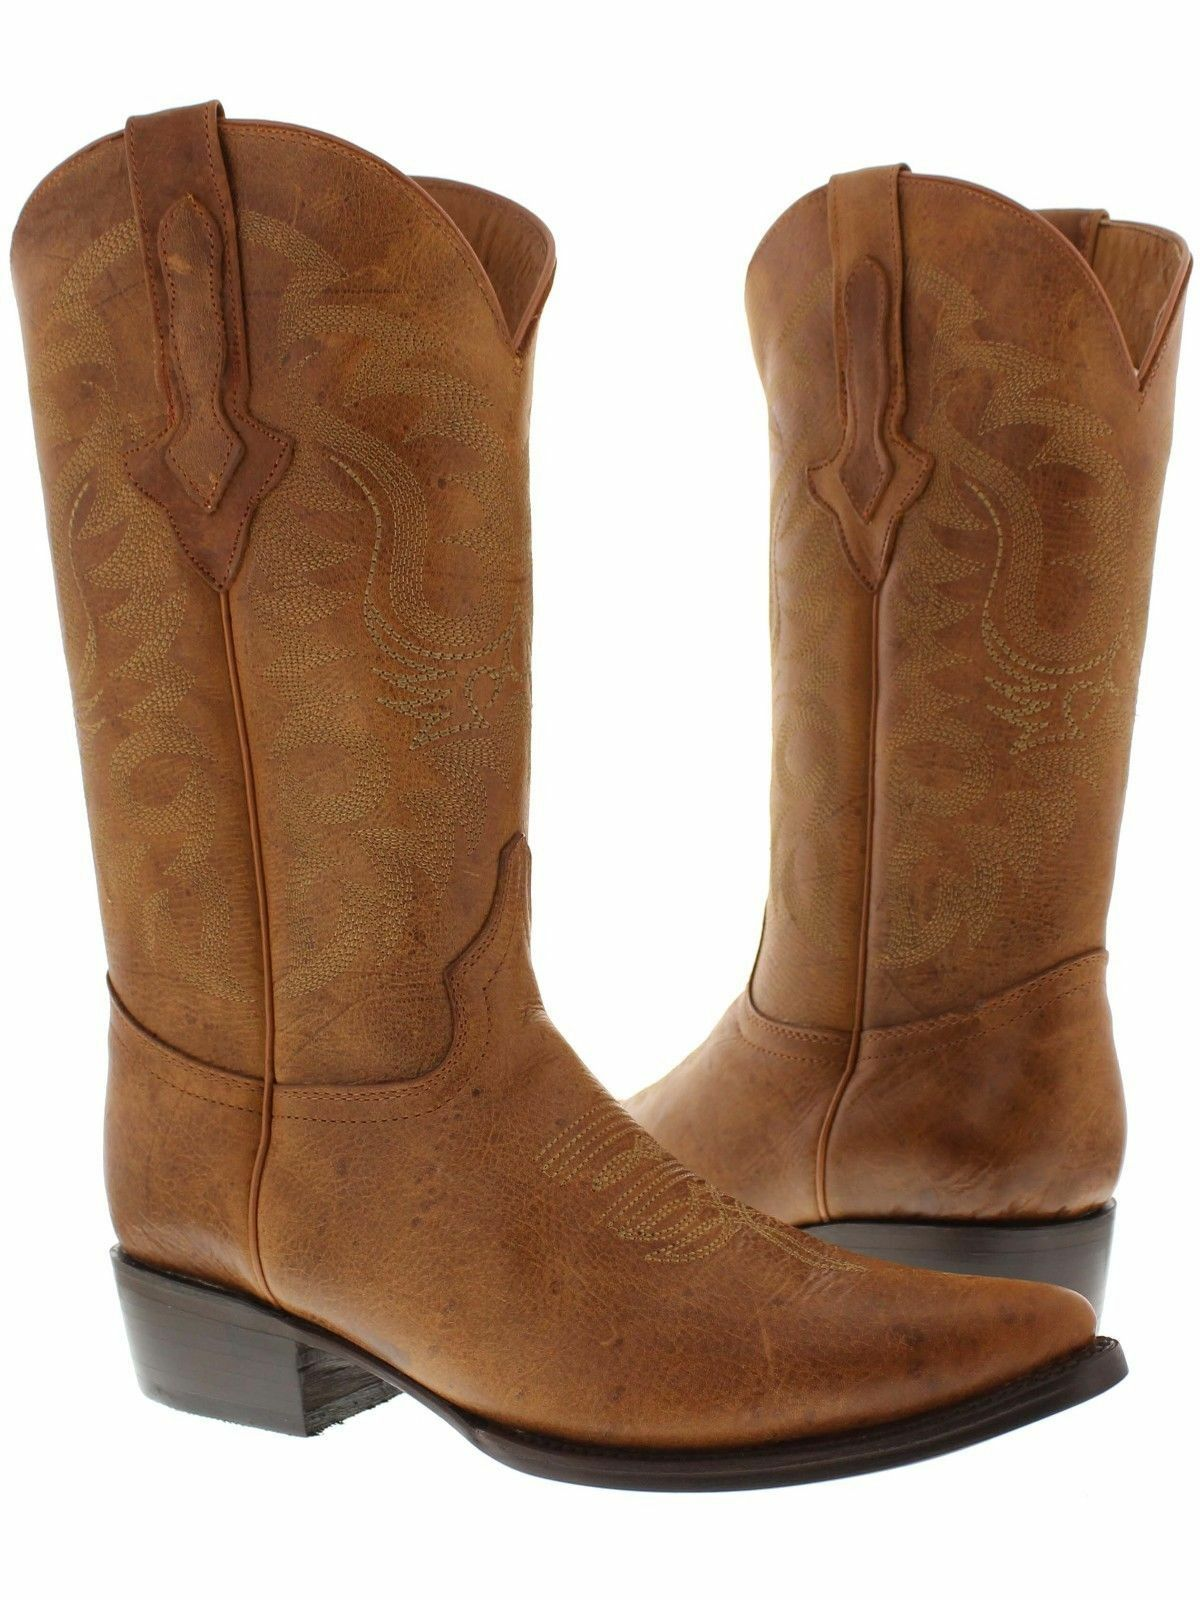 Mens Original Cognac Full Plain Leather Western Cowboy Boots